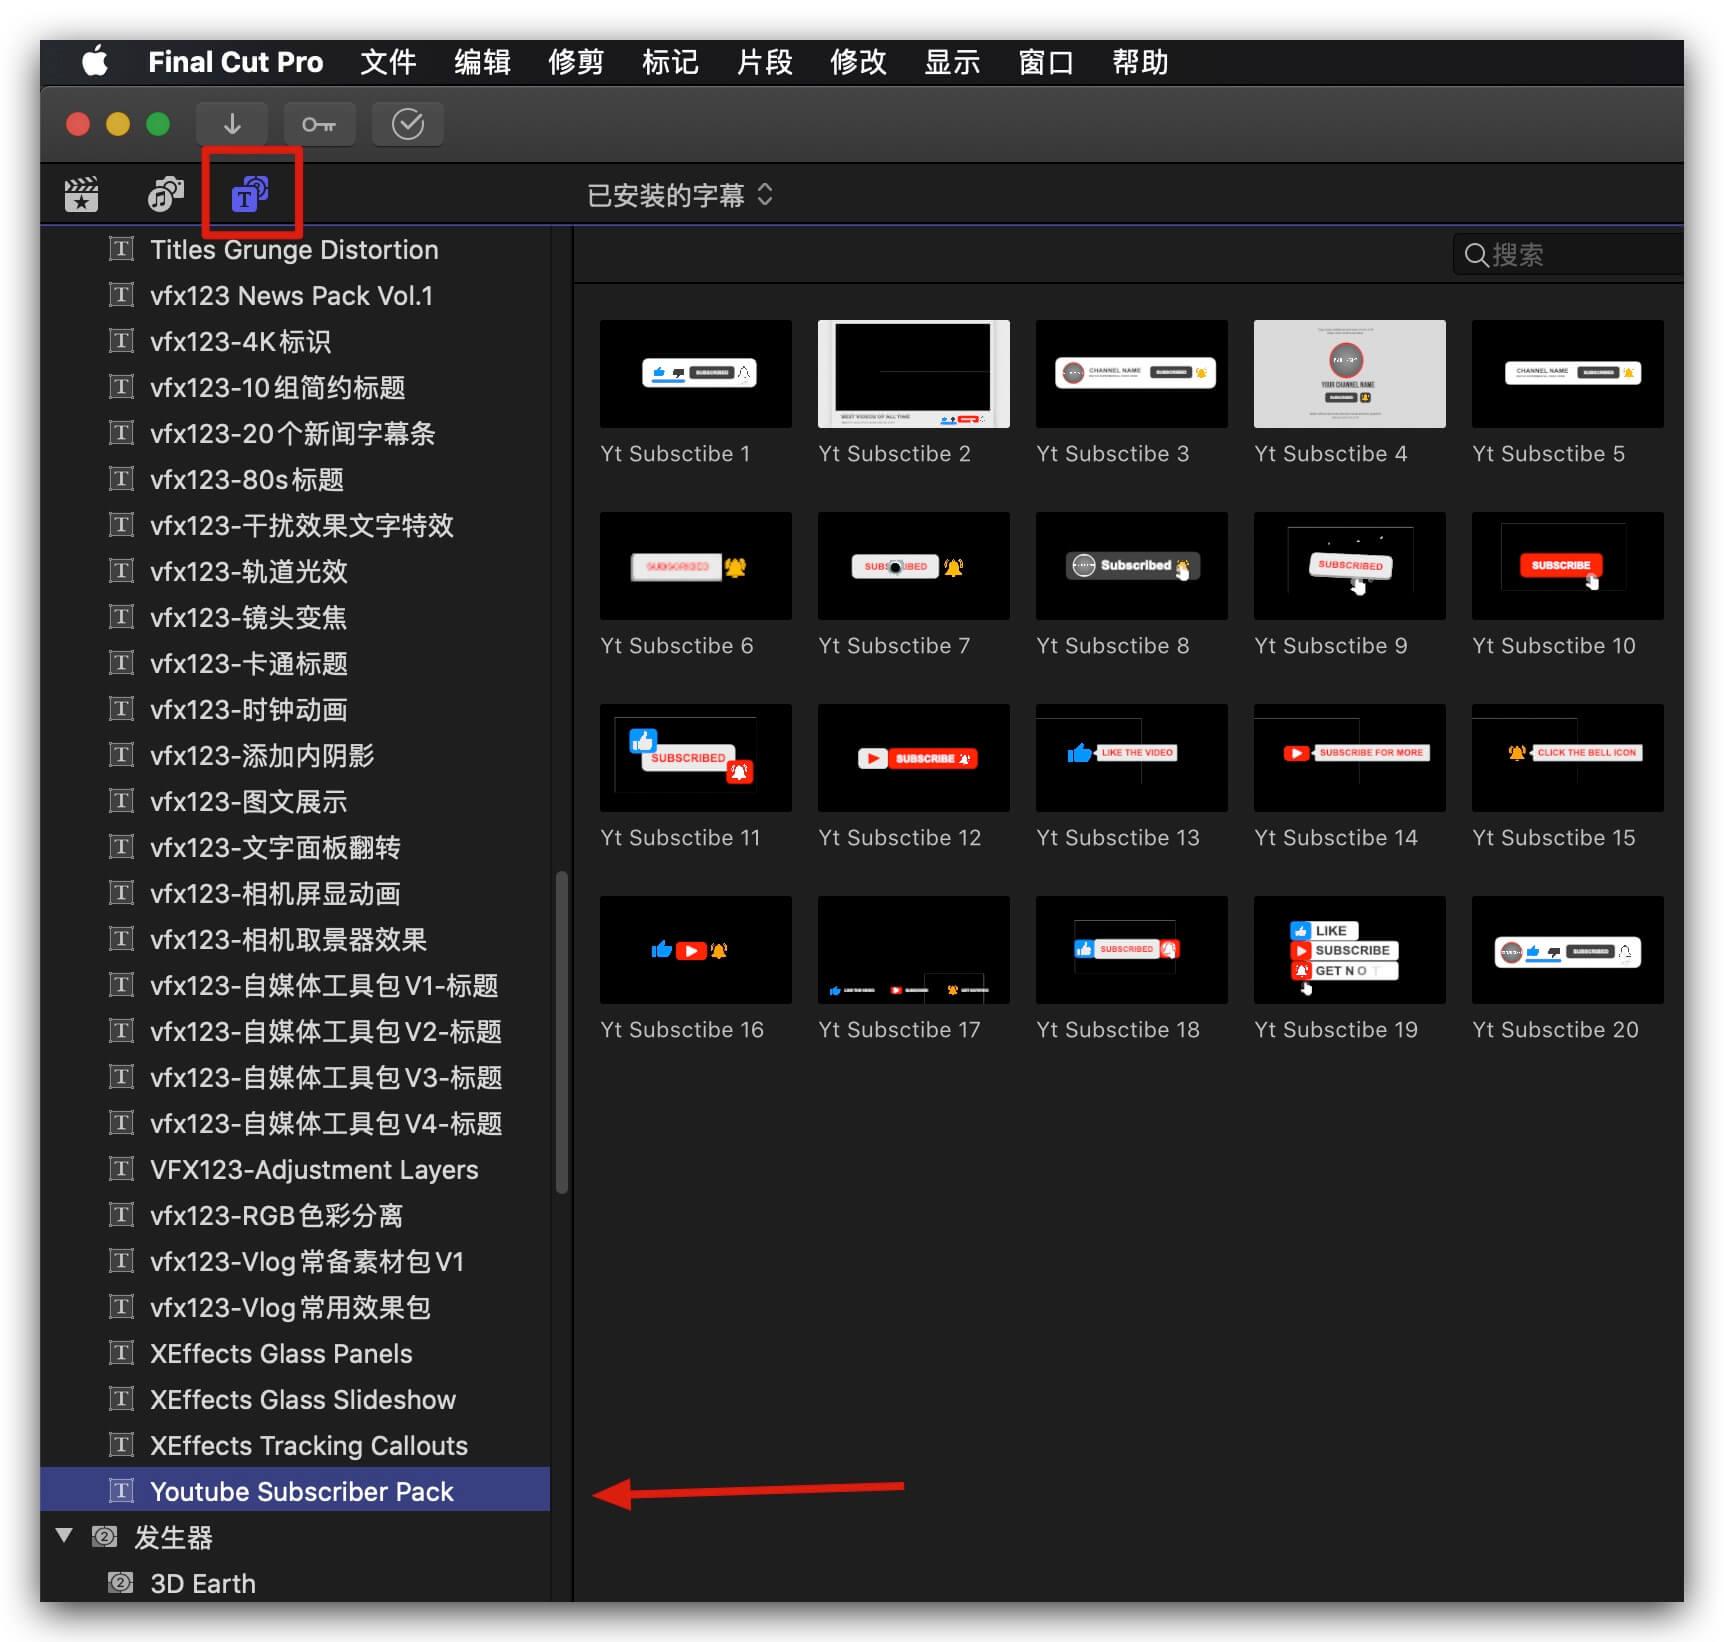 fcpx插件 20个自媒体影片制作包 点赞订阅按钮铃铛动画 Subscriber Pack